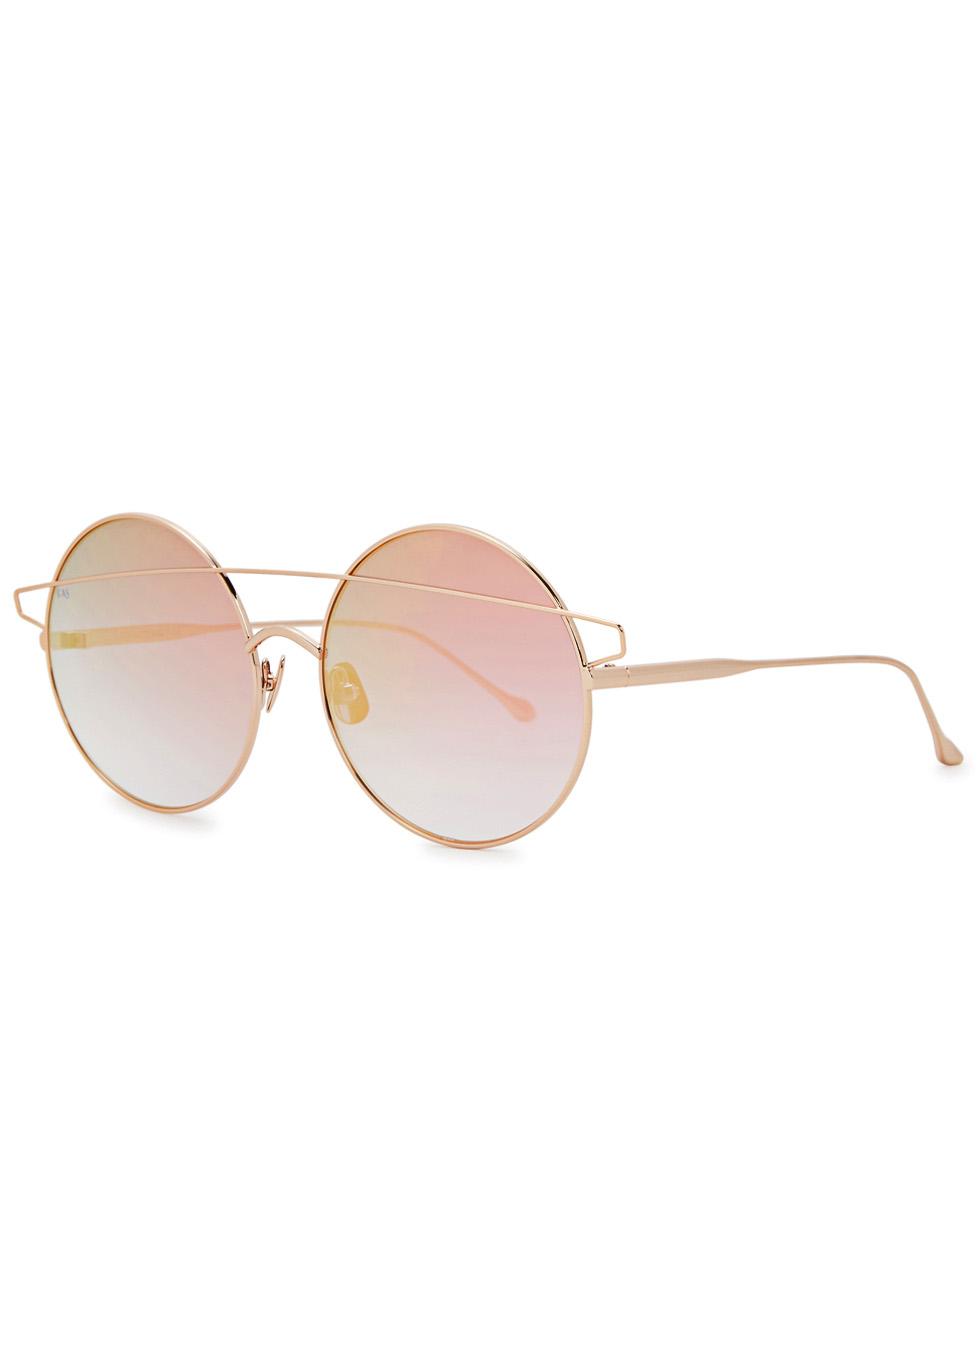 Mykonos rose gold tone round sunglasses - FOR ART'S SAKE